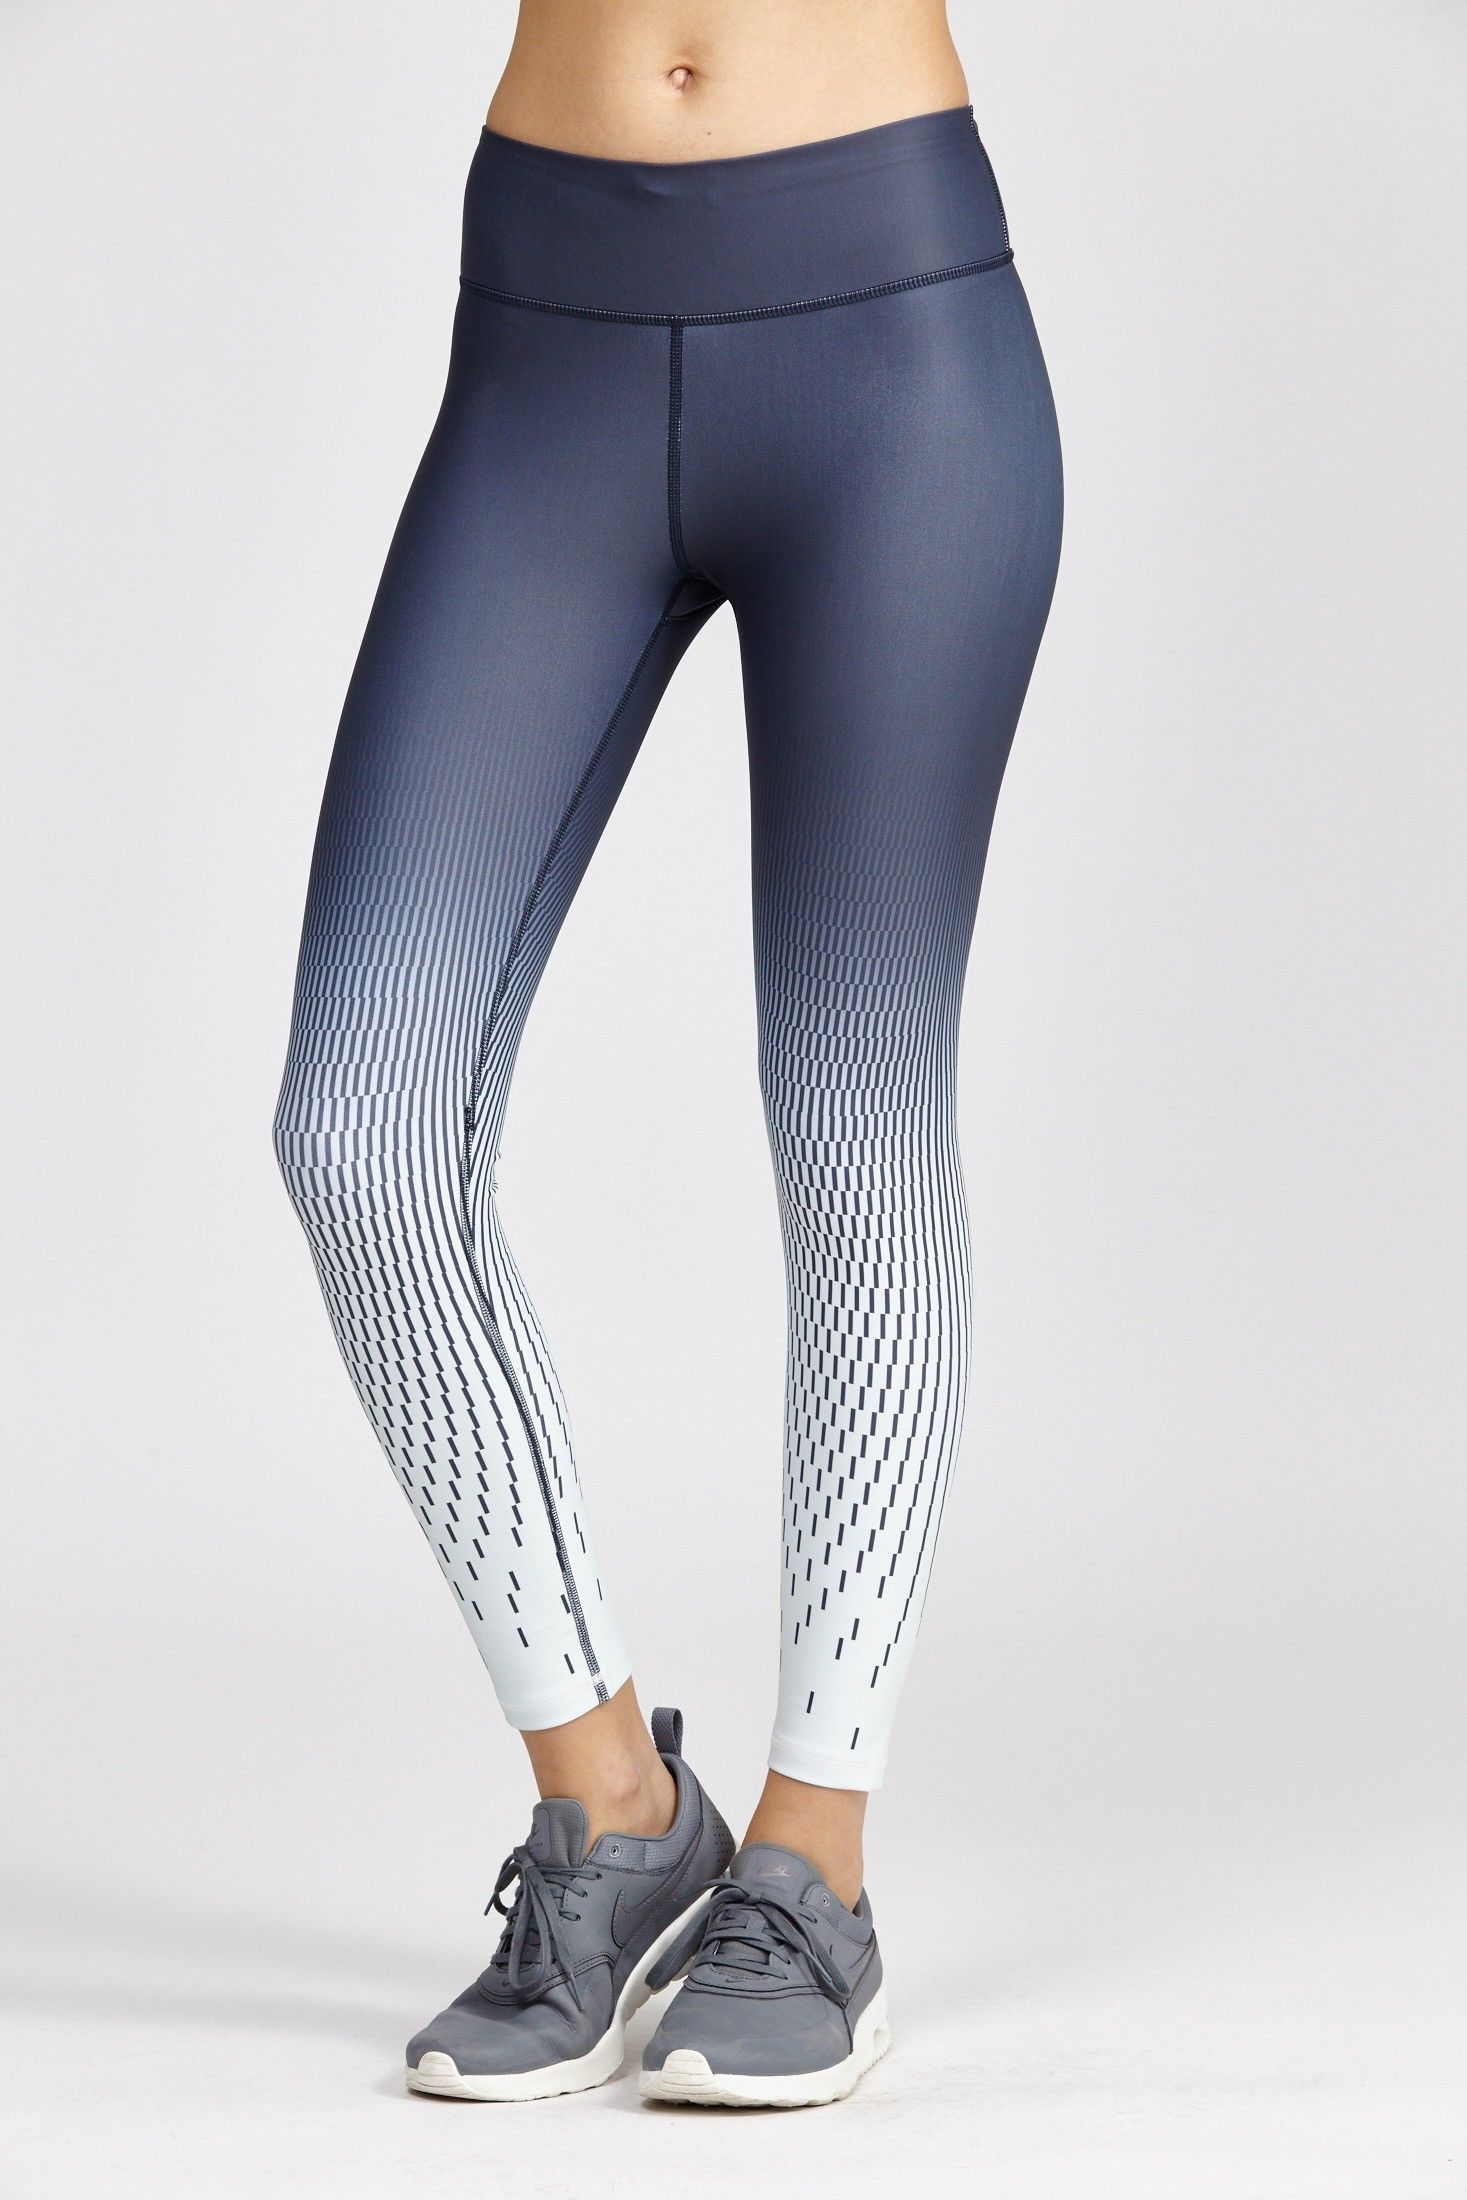 Tessa 7 8 Tight Cute Running Outfit Yoga Fashion Cute Gym Outfits [ 2200 x 1467 Pixel ]